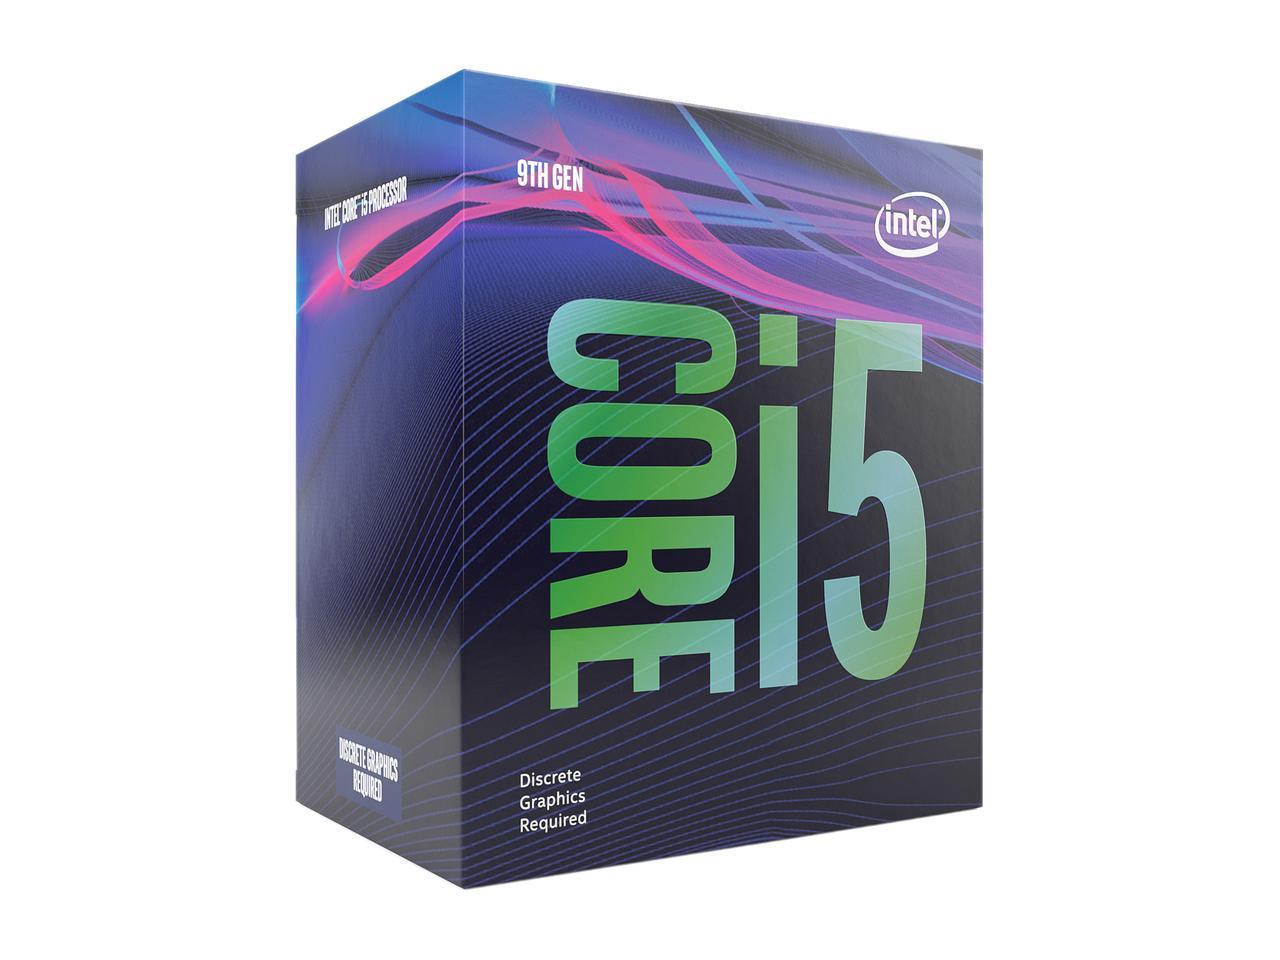 Intel Core i5-9400 Desktop Processor 6 Cores up to 4.1 GHz Turbo LGA1151 300 Ser